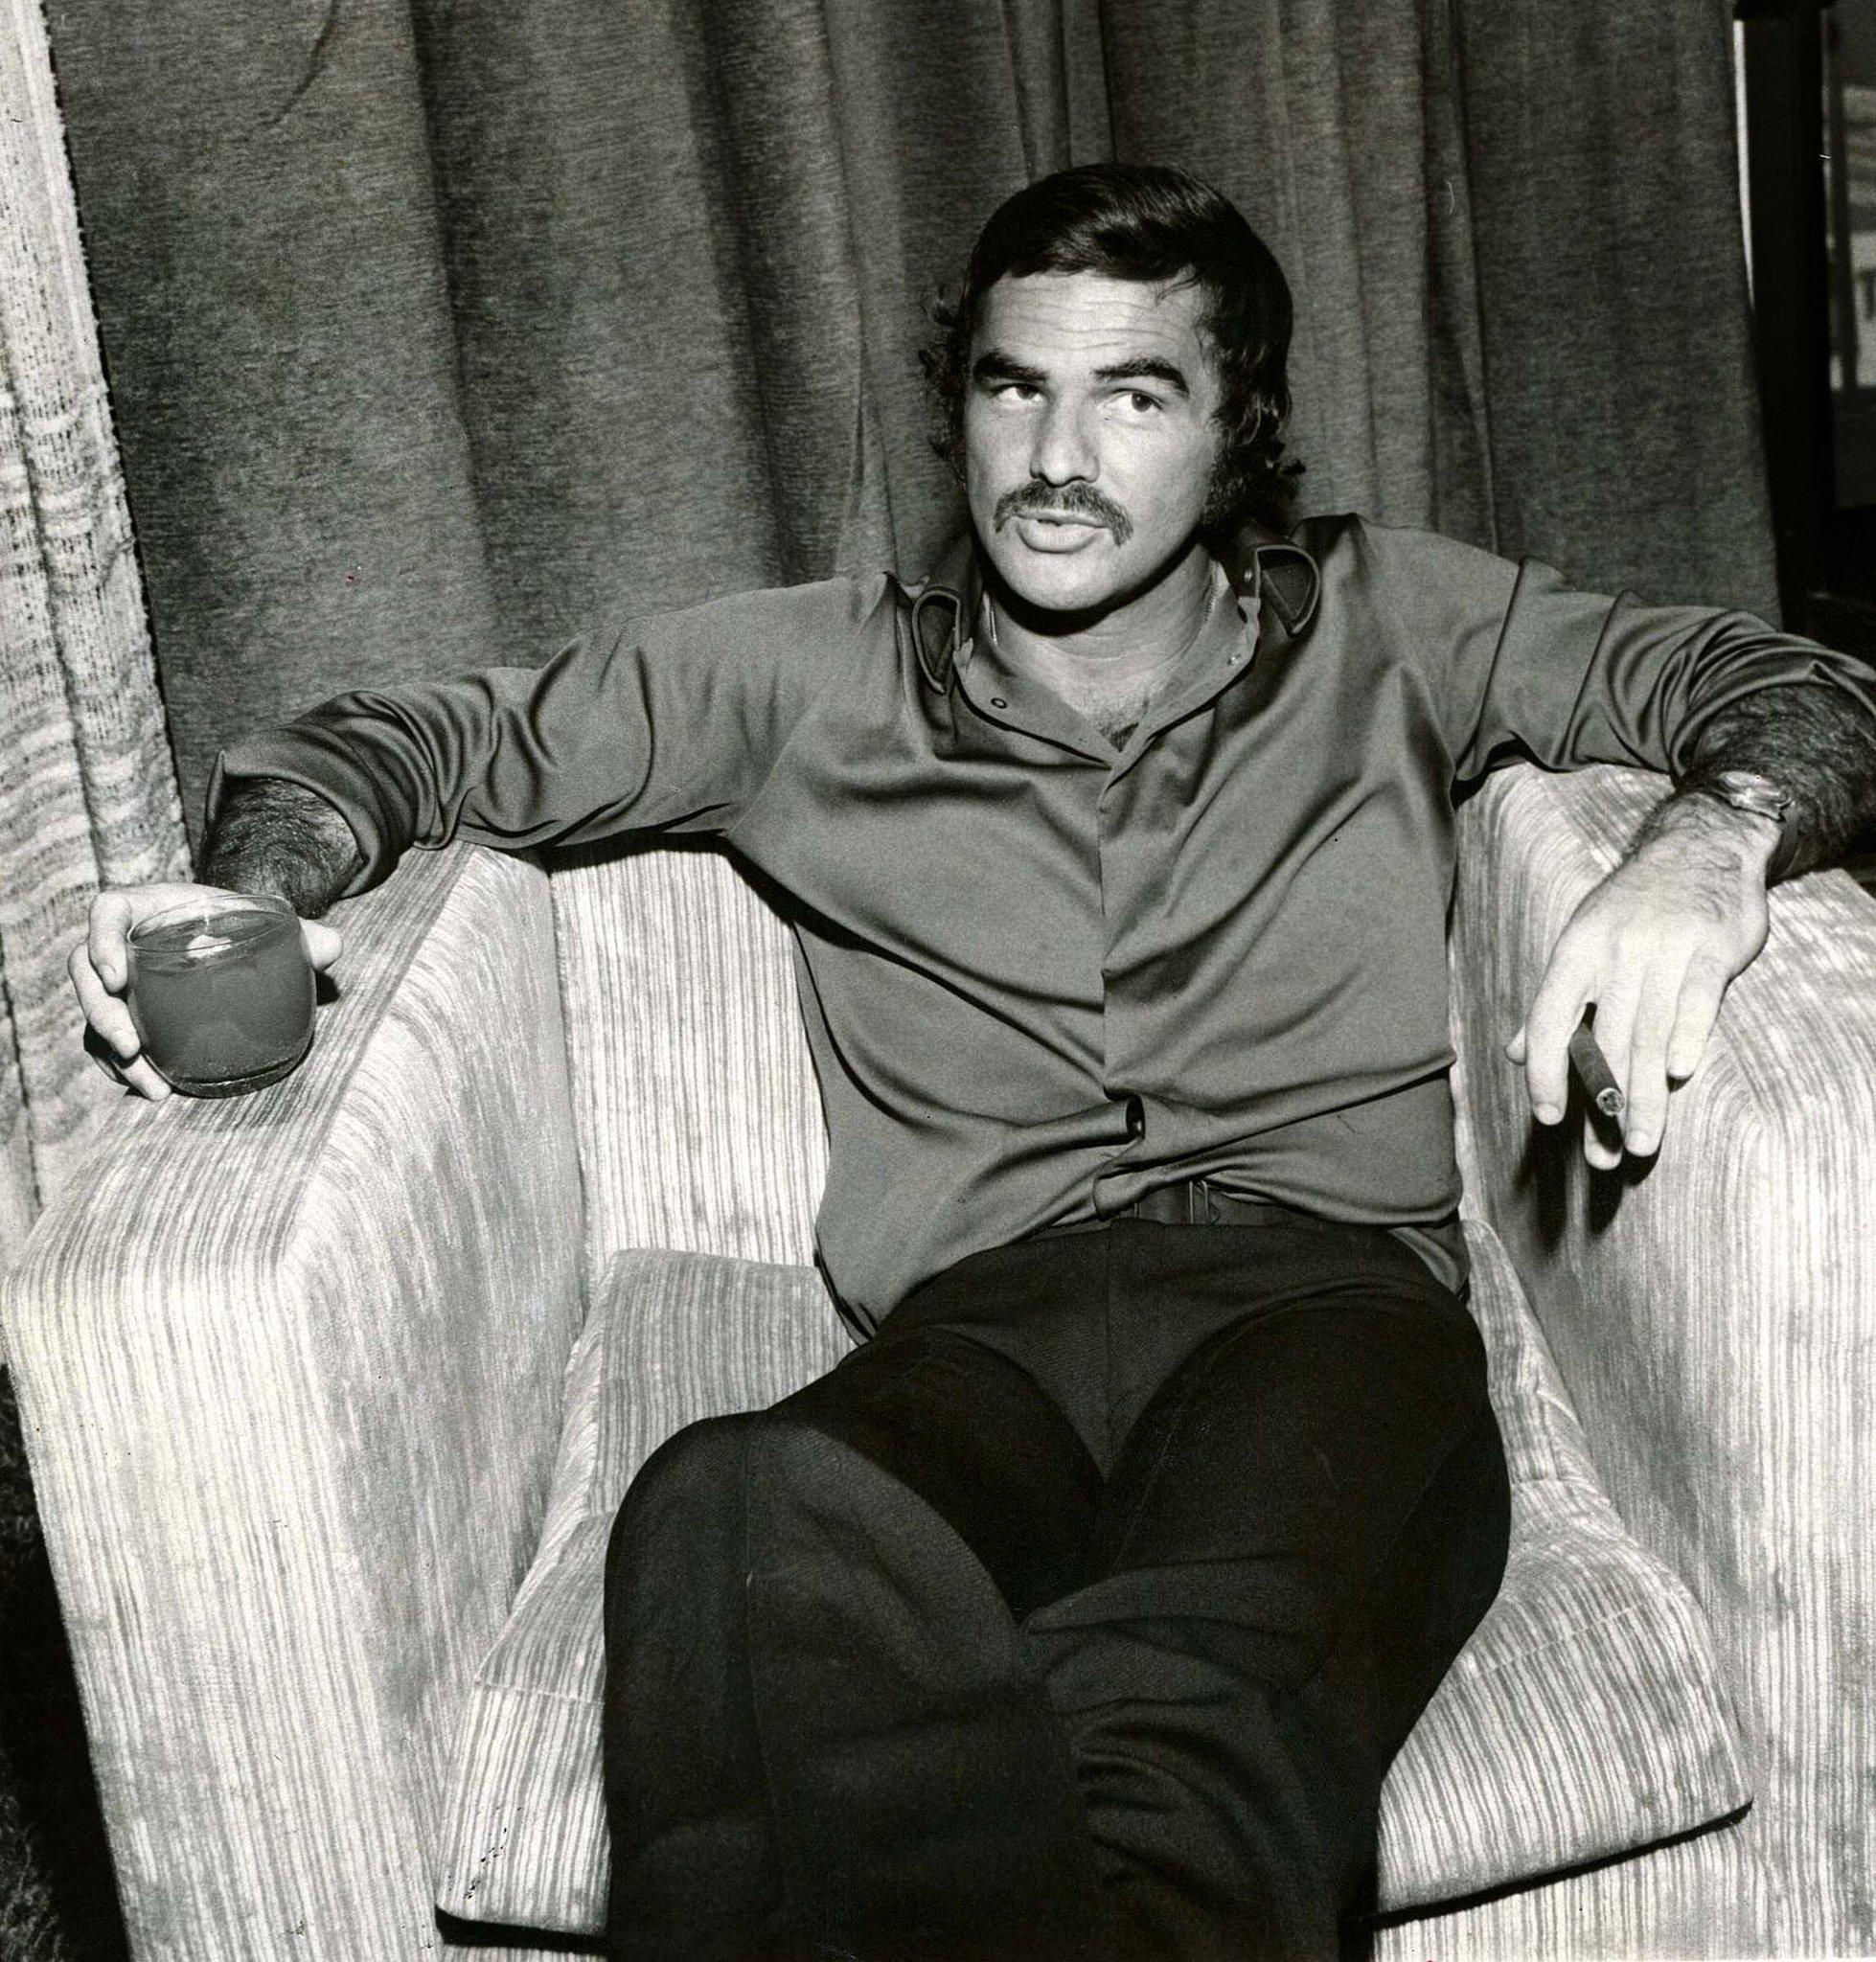 Happy birthday to Burt Reynolds. Photo from 1972.